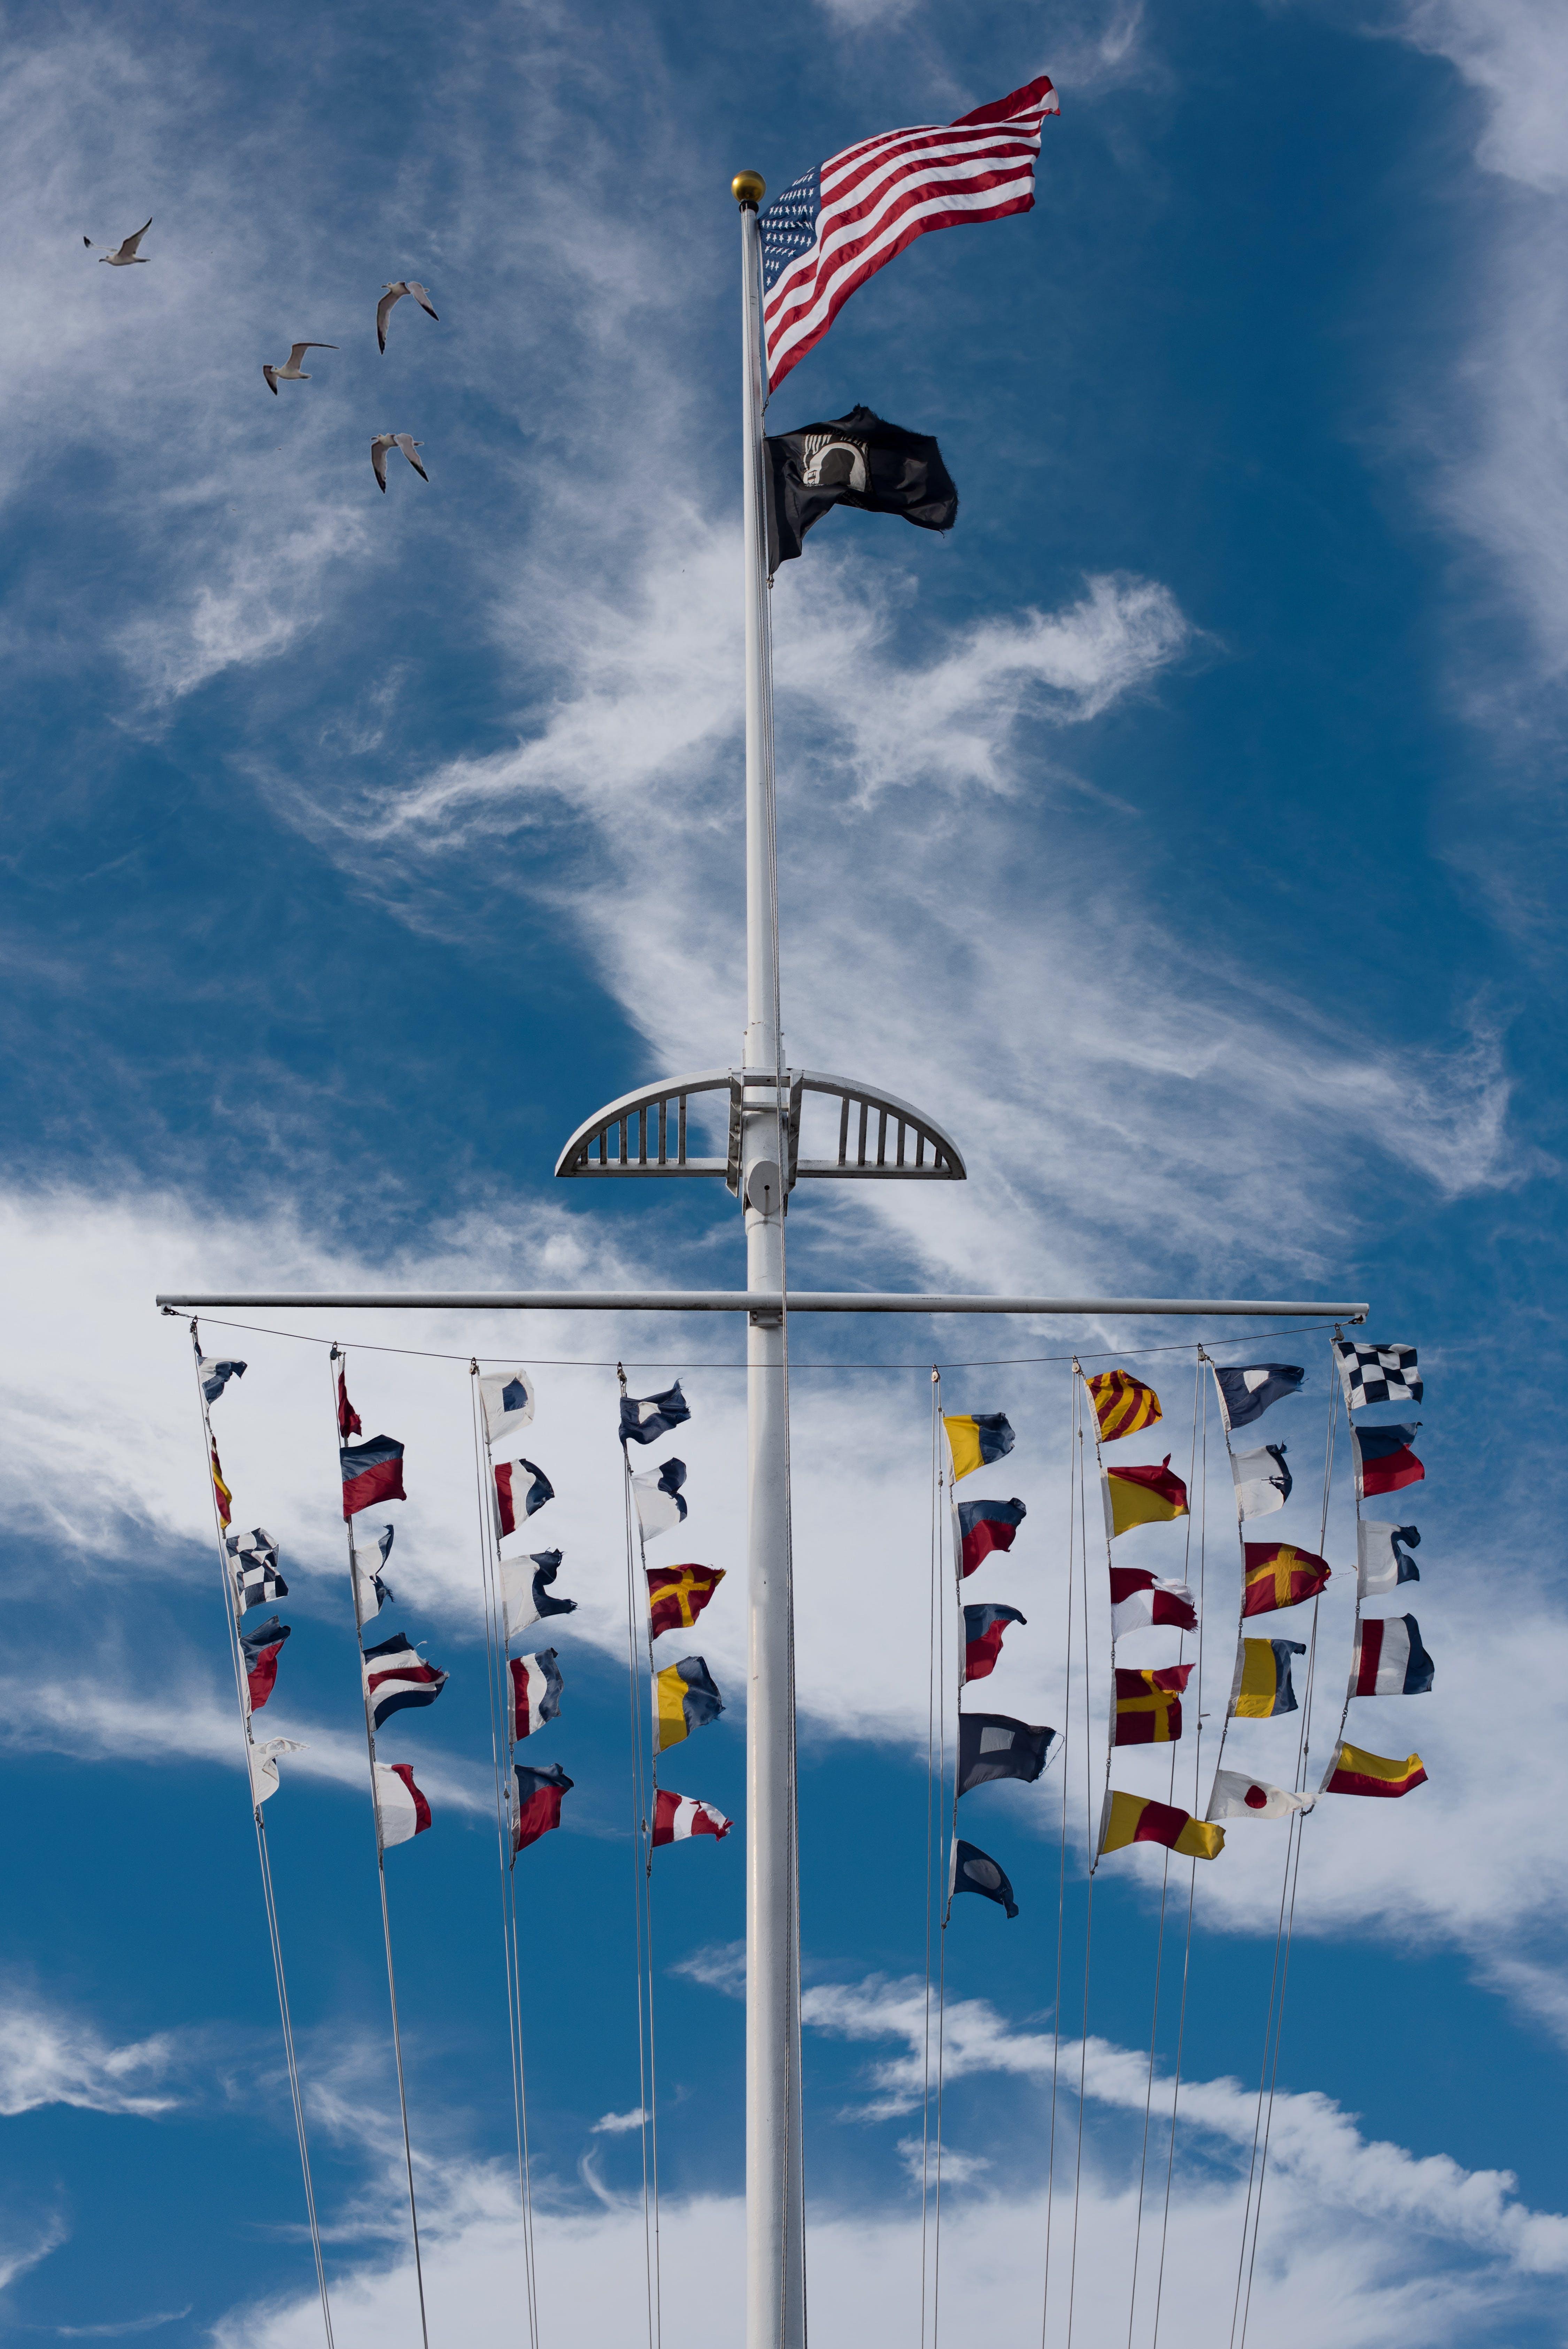 Free stock photo of sunny, beach, flags, birds